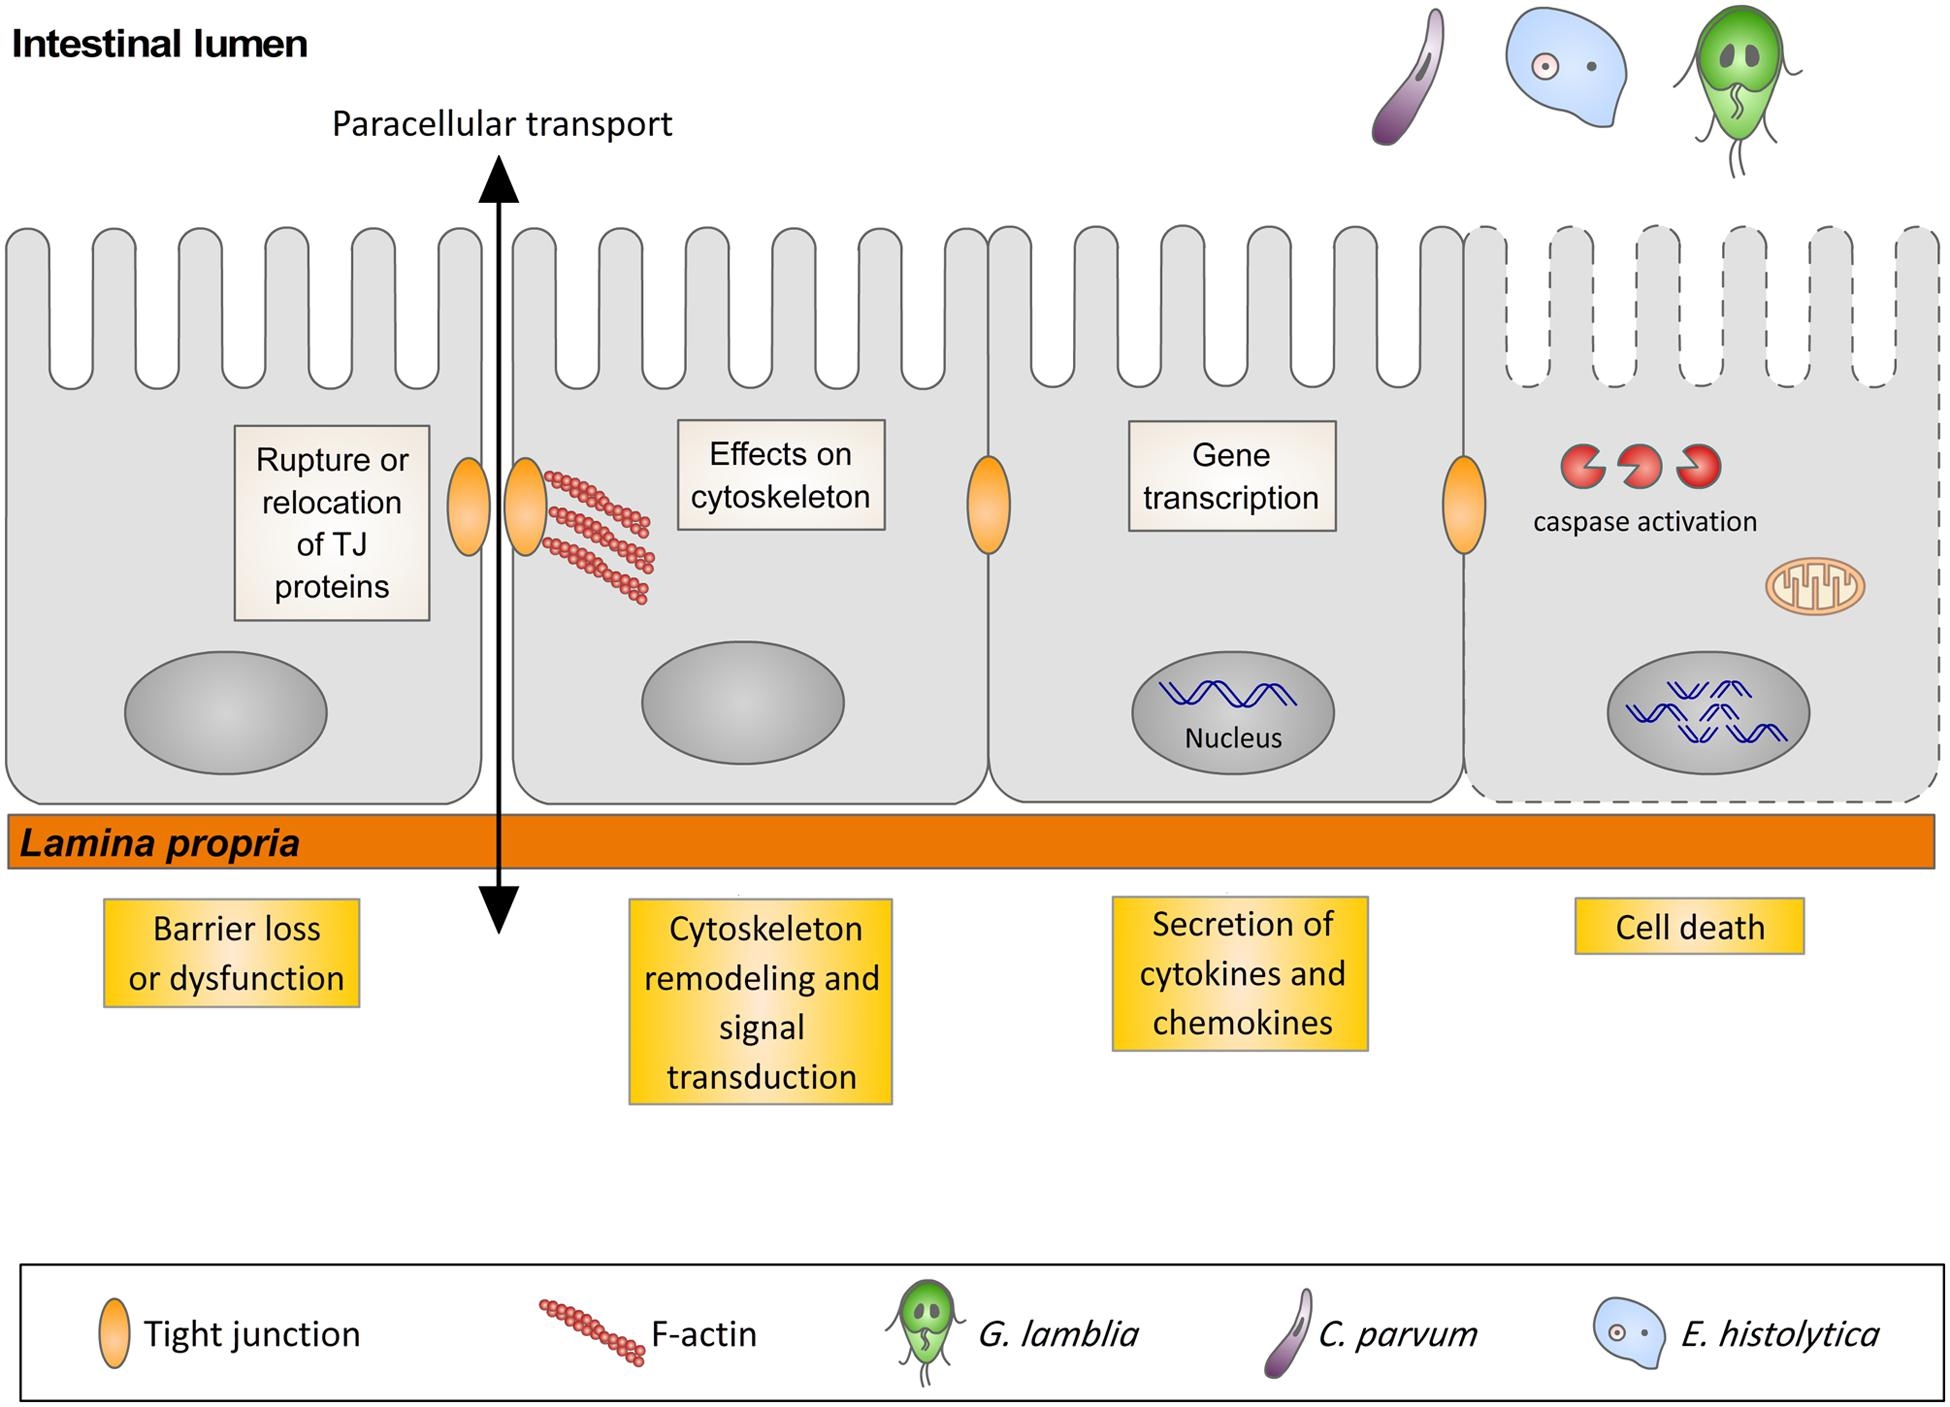 giardia duodenalis pathogenesis